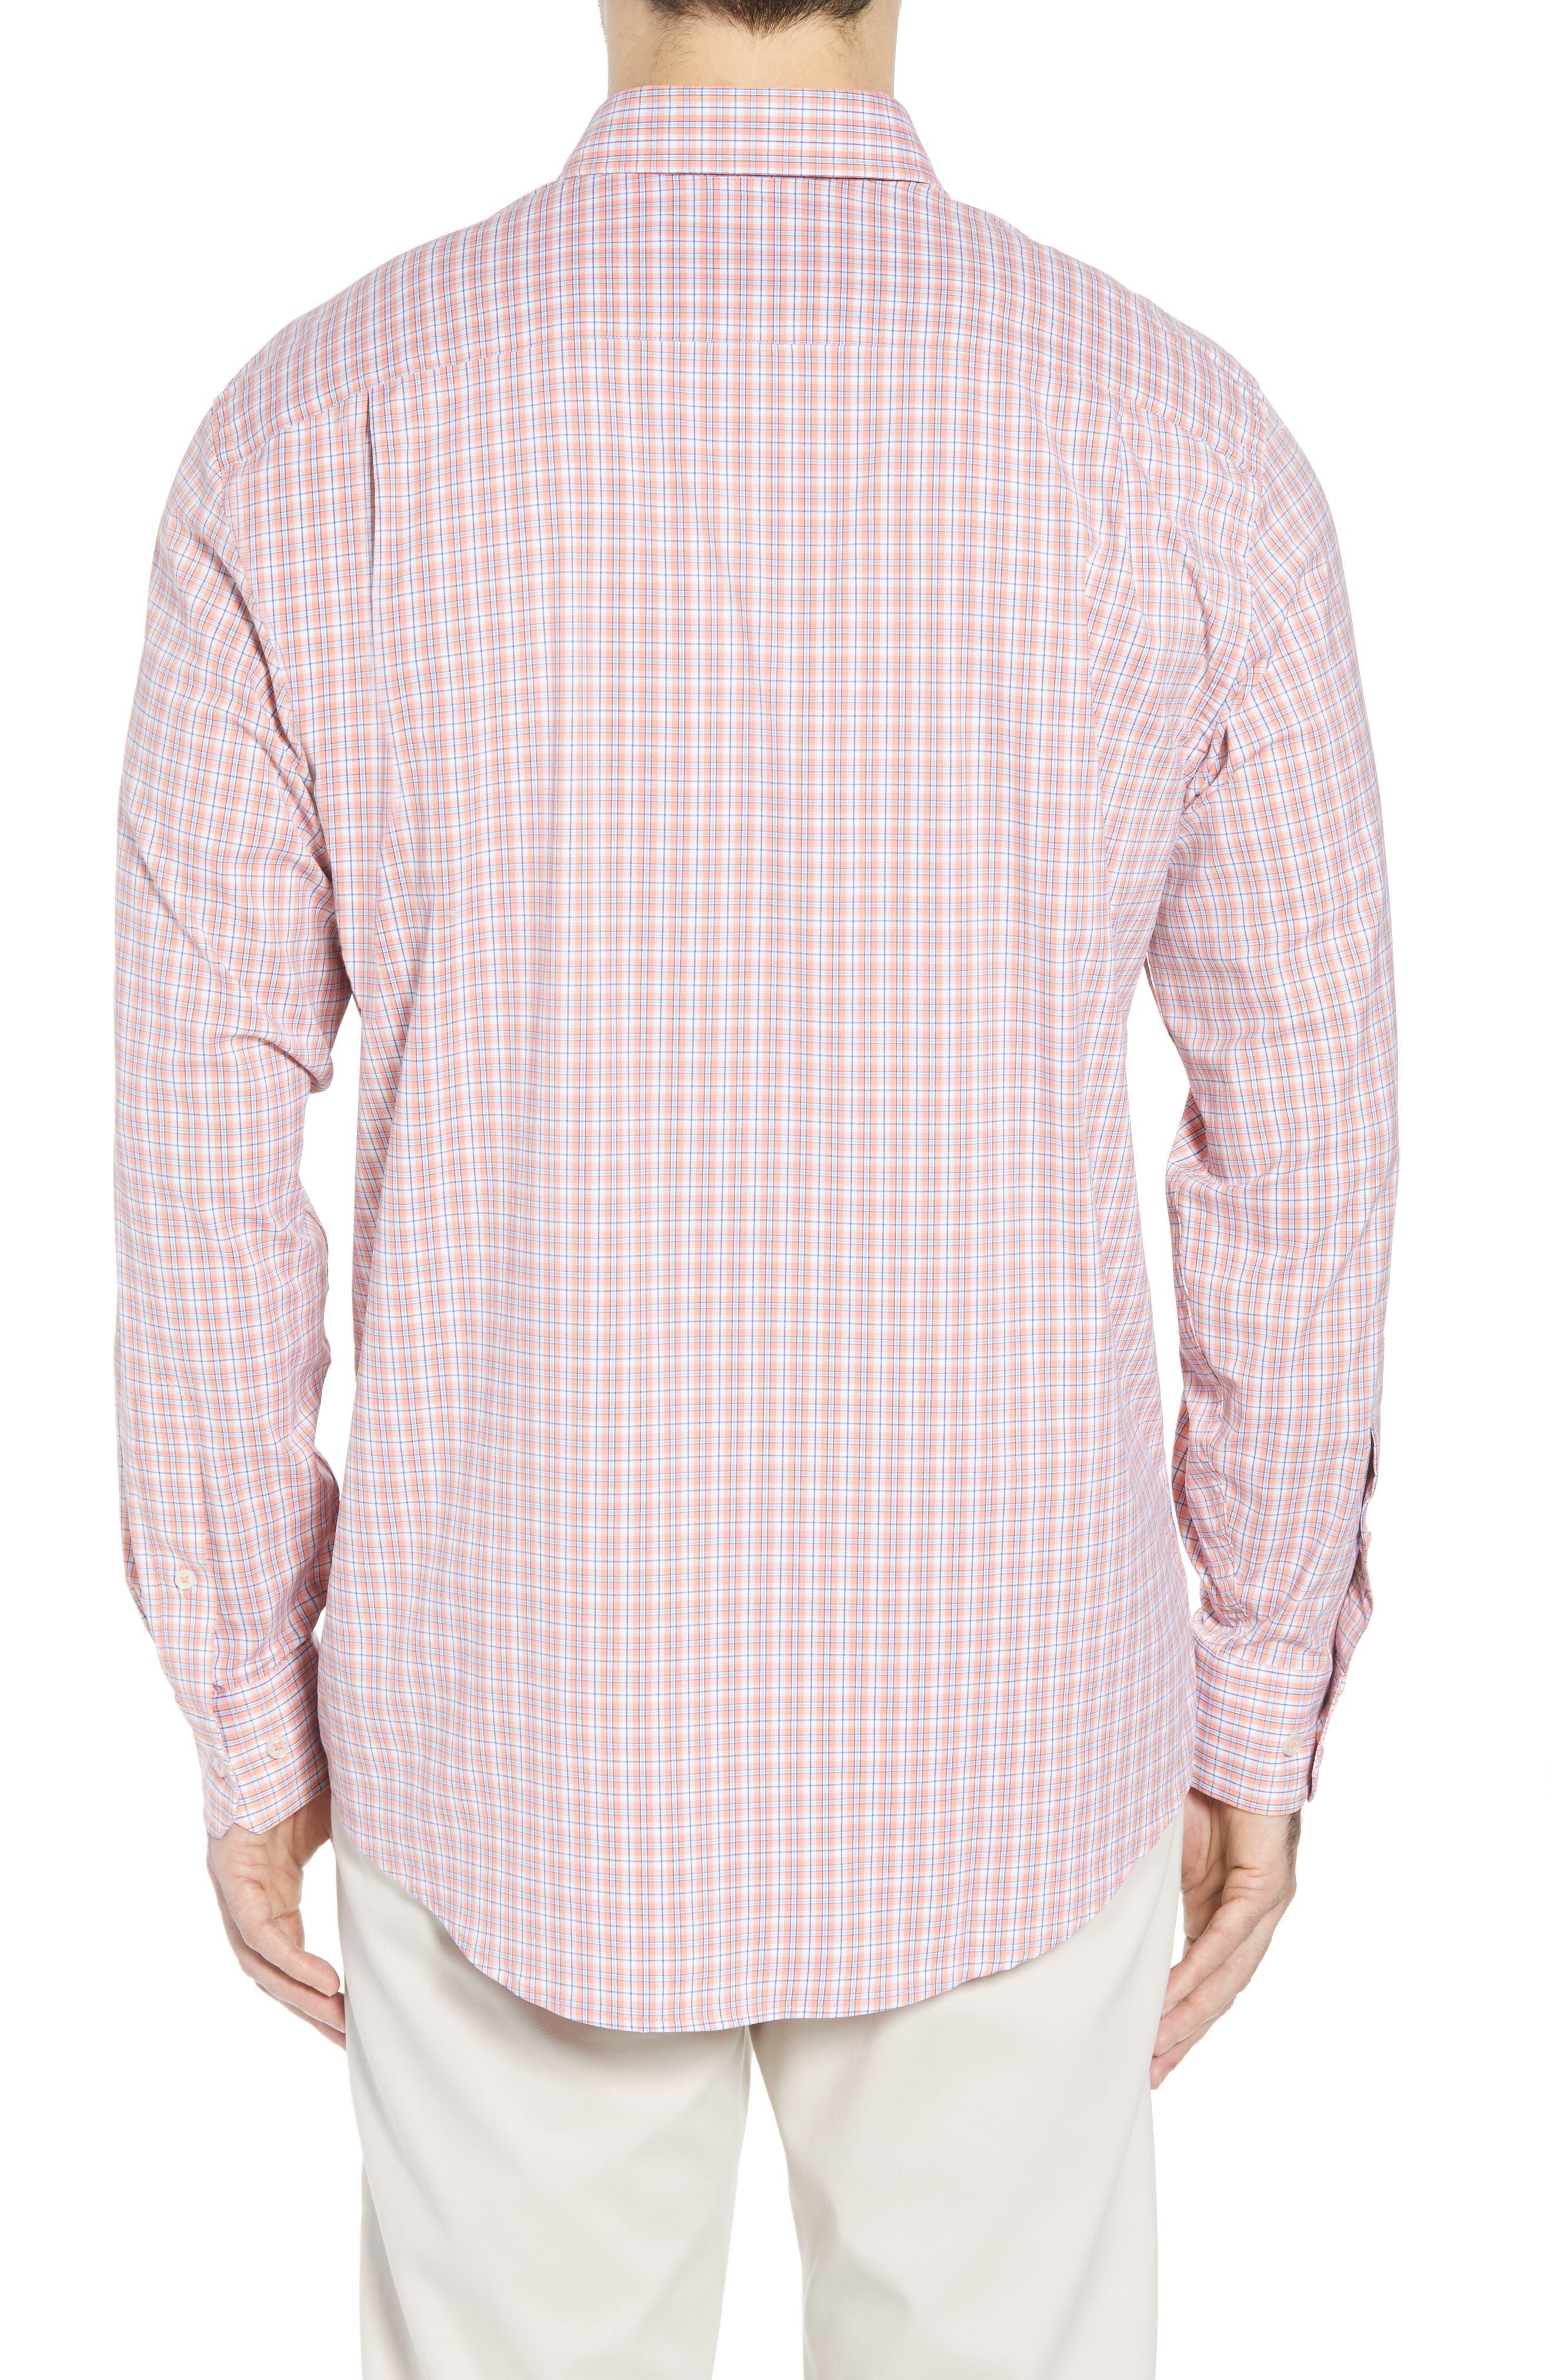 Grand Turk Regular Fit Stretch Plaid Sport Shirt,                             Alternate thumbnail 2, color,                             801